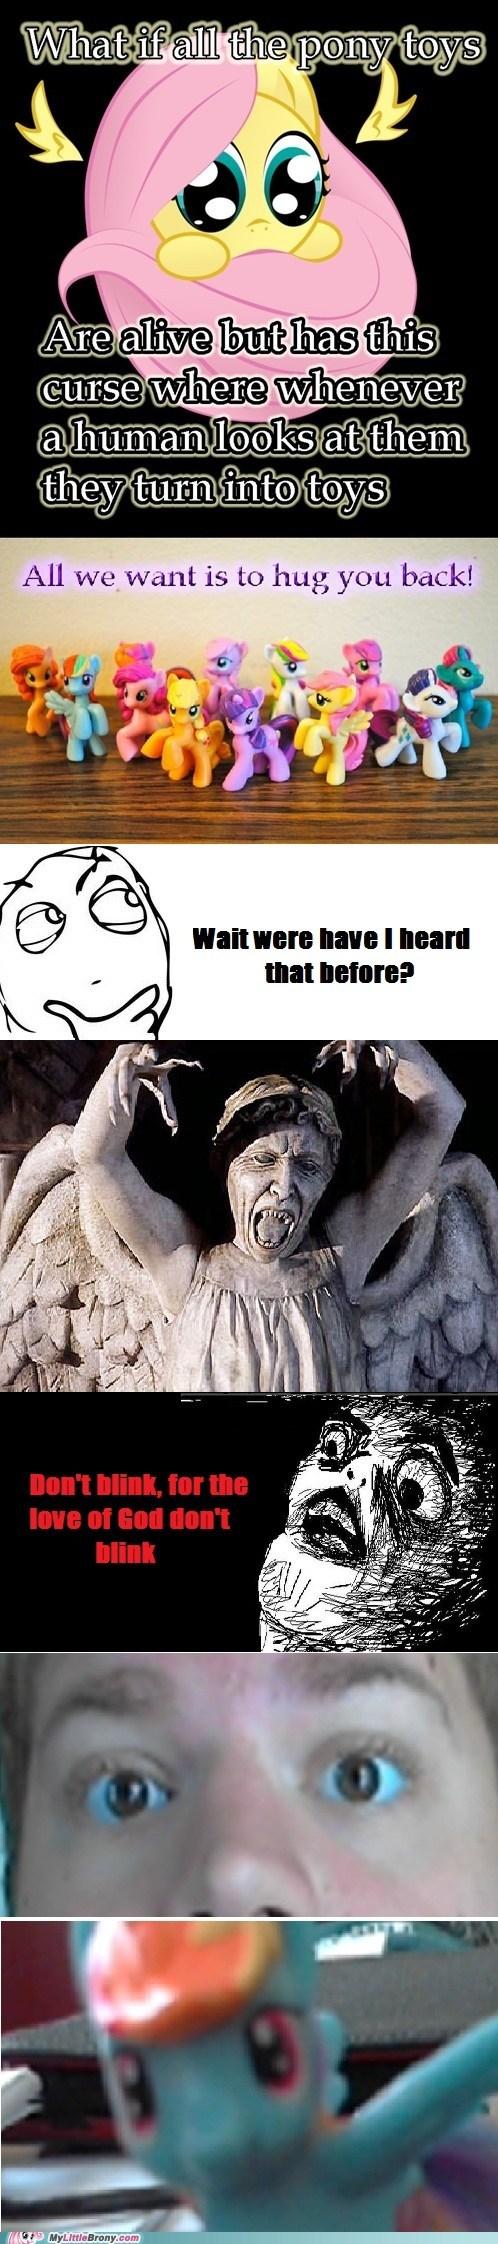 blink doctor who fluttershy hug toys weeping angels - 6347833344